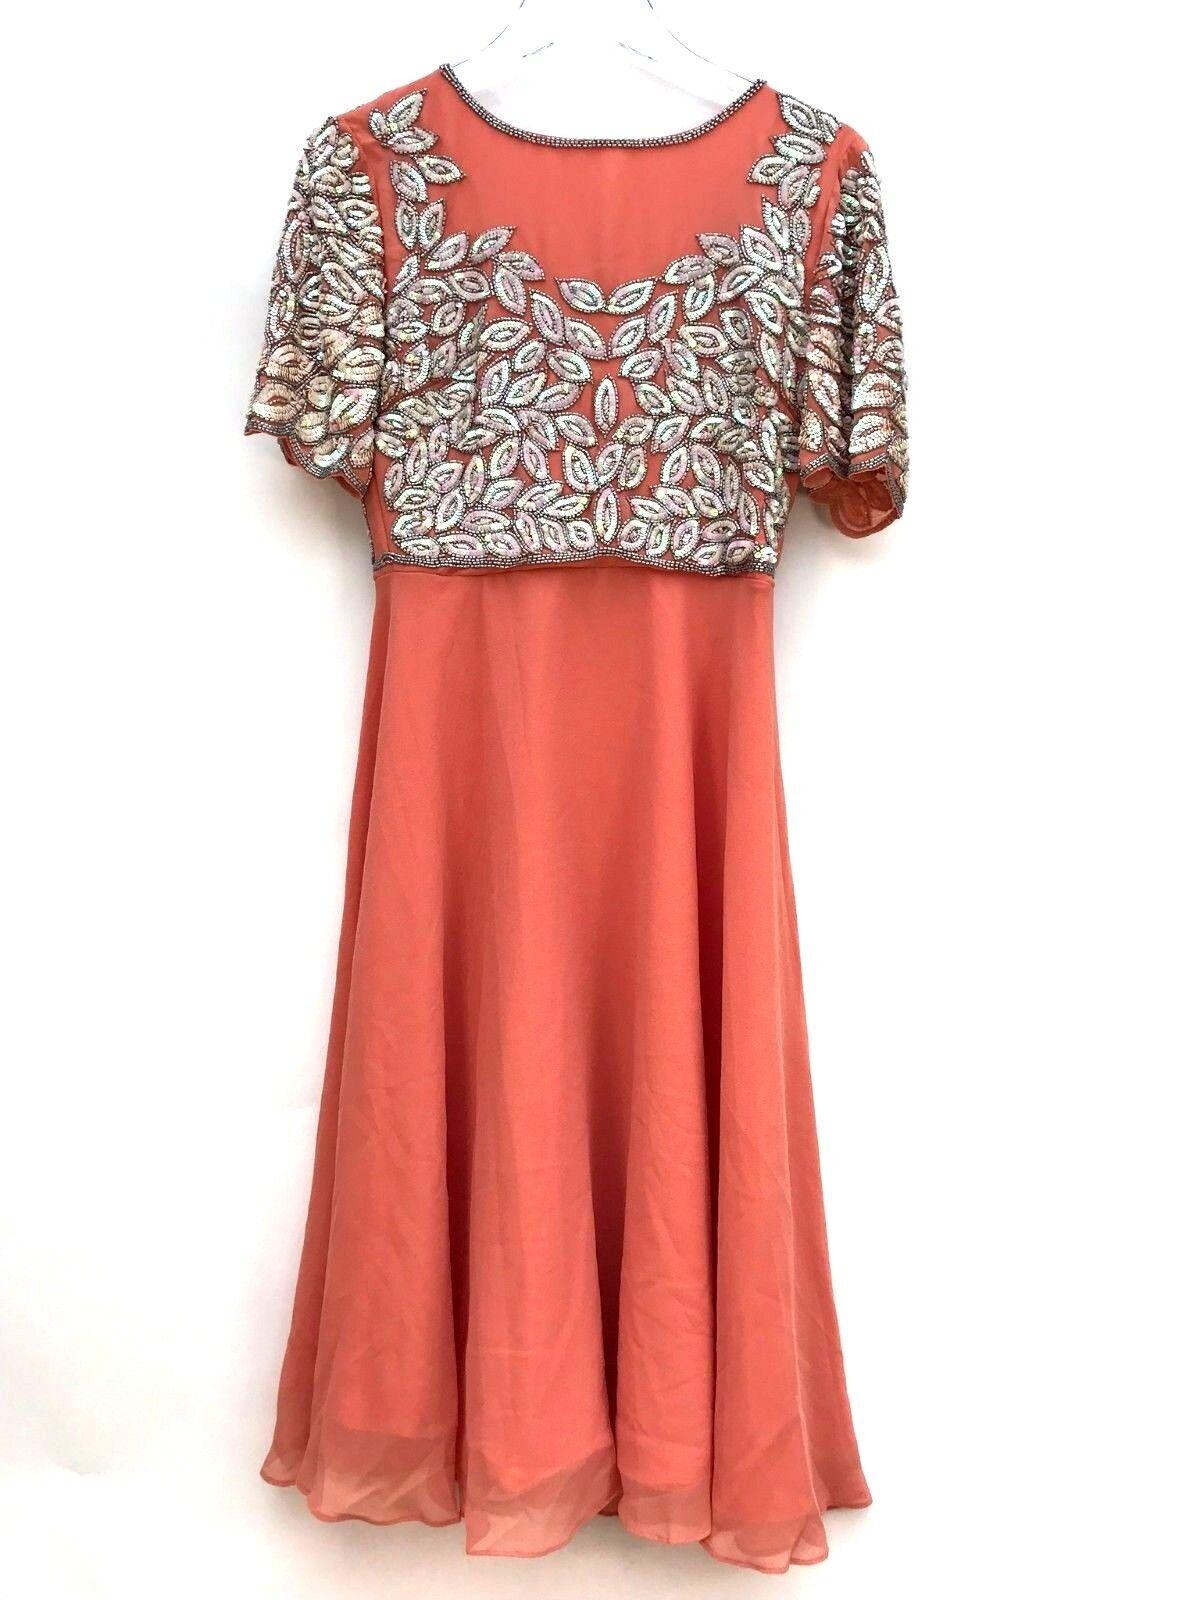 Virgos Lounge Vilma Peach Embellished Party Midi Dress Größe UK10 EUR38 US6